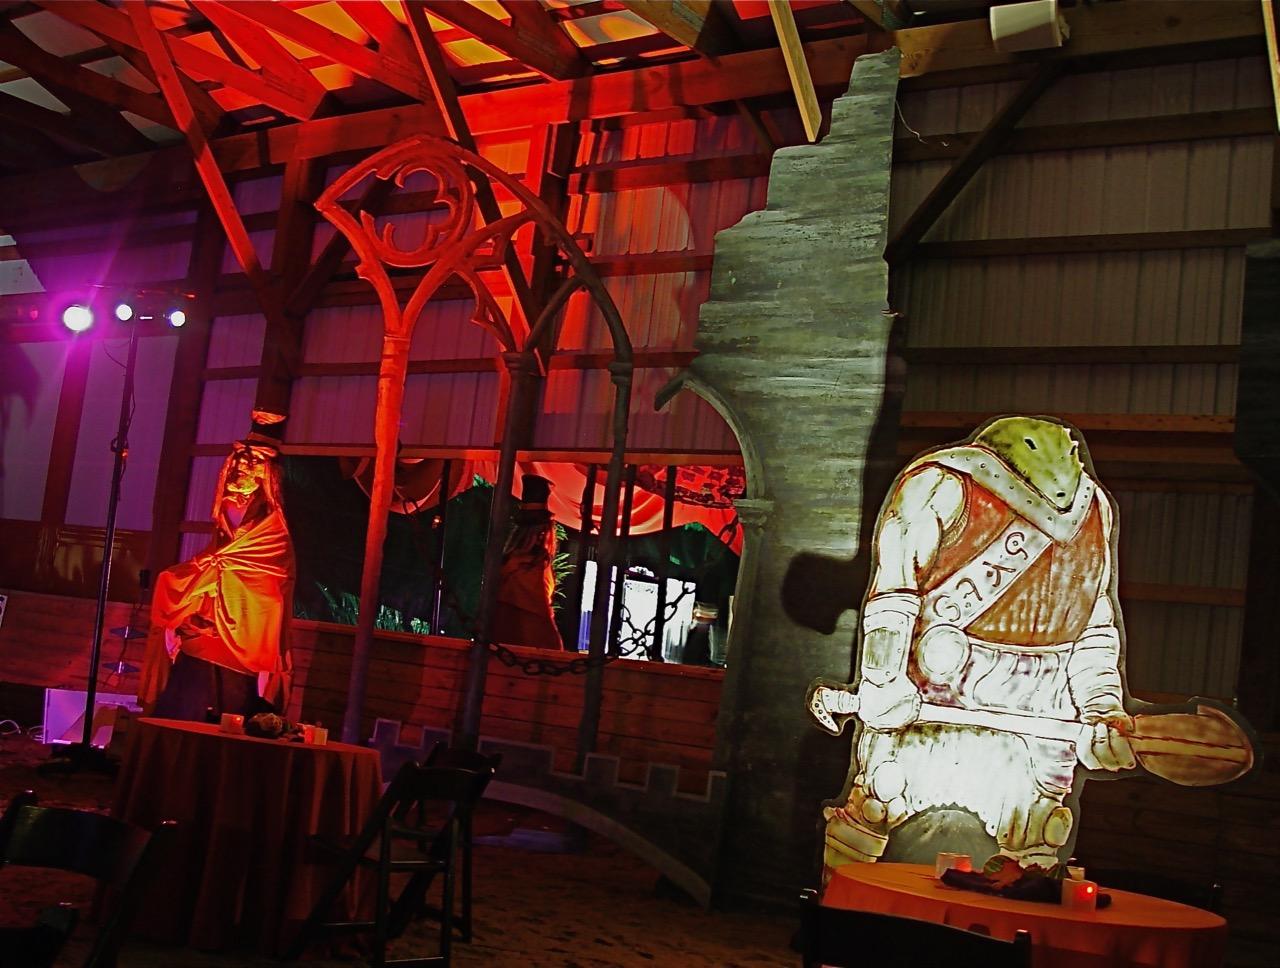 Halloween+Lighting+and+Decor+Rentals+Eggsotic+Events+NJ+NYC+Event+Design+-+1.jpg